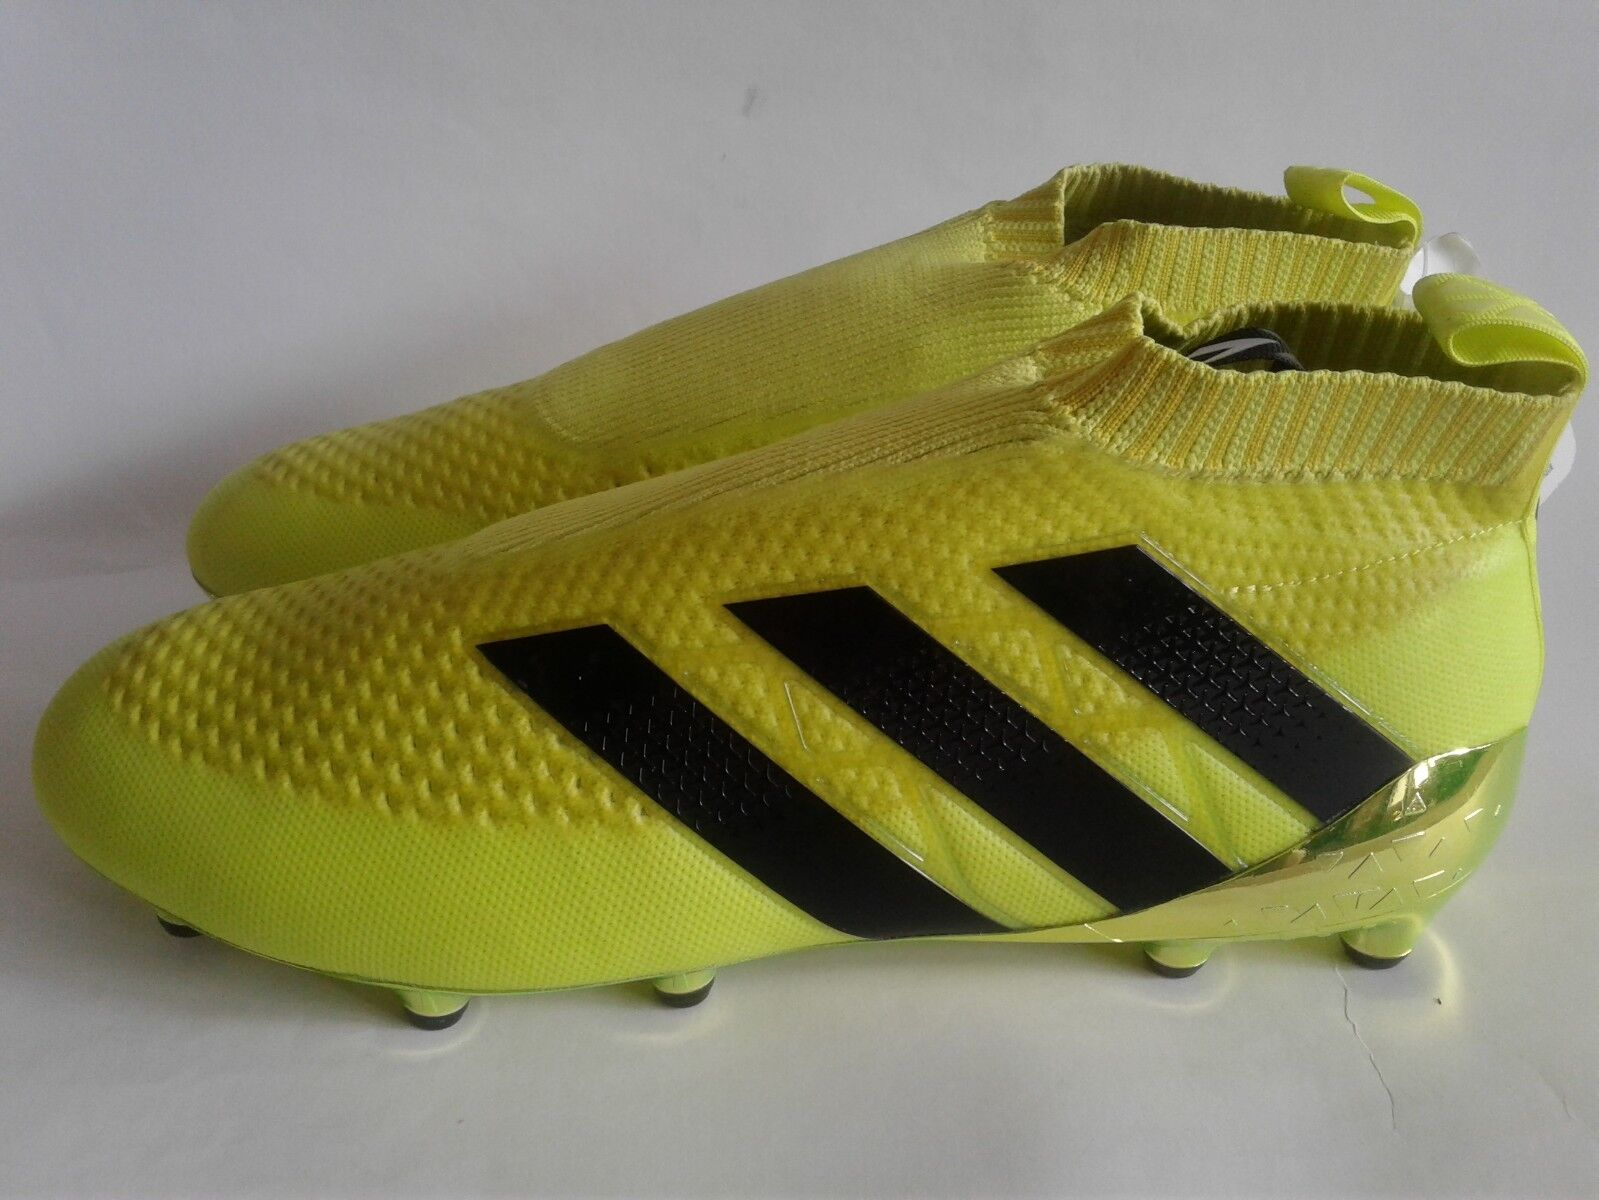 Adidas ACE 16+ Purecontrol Primeknit FG AQ3805